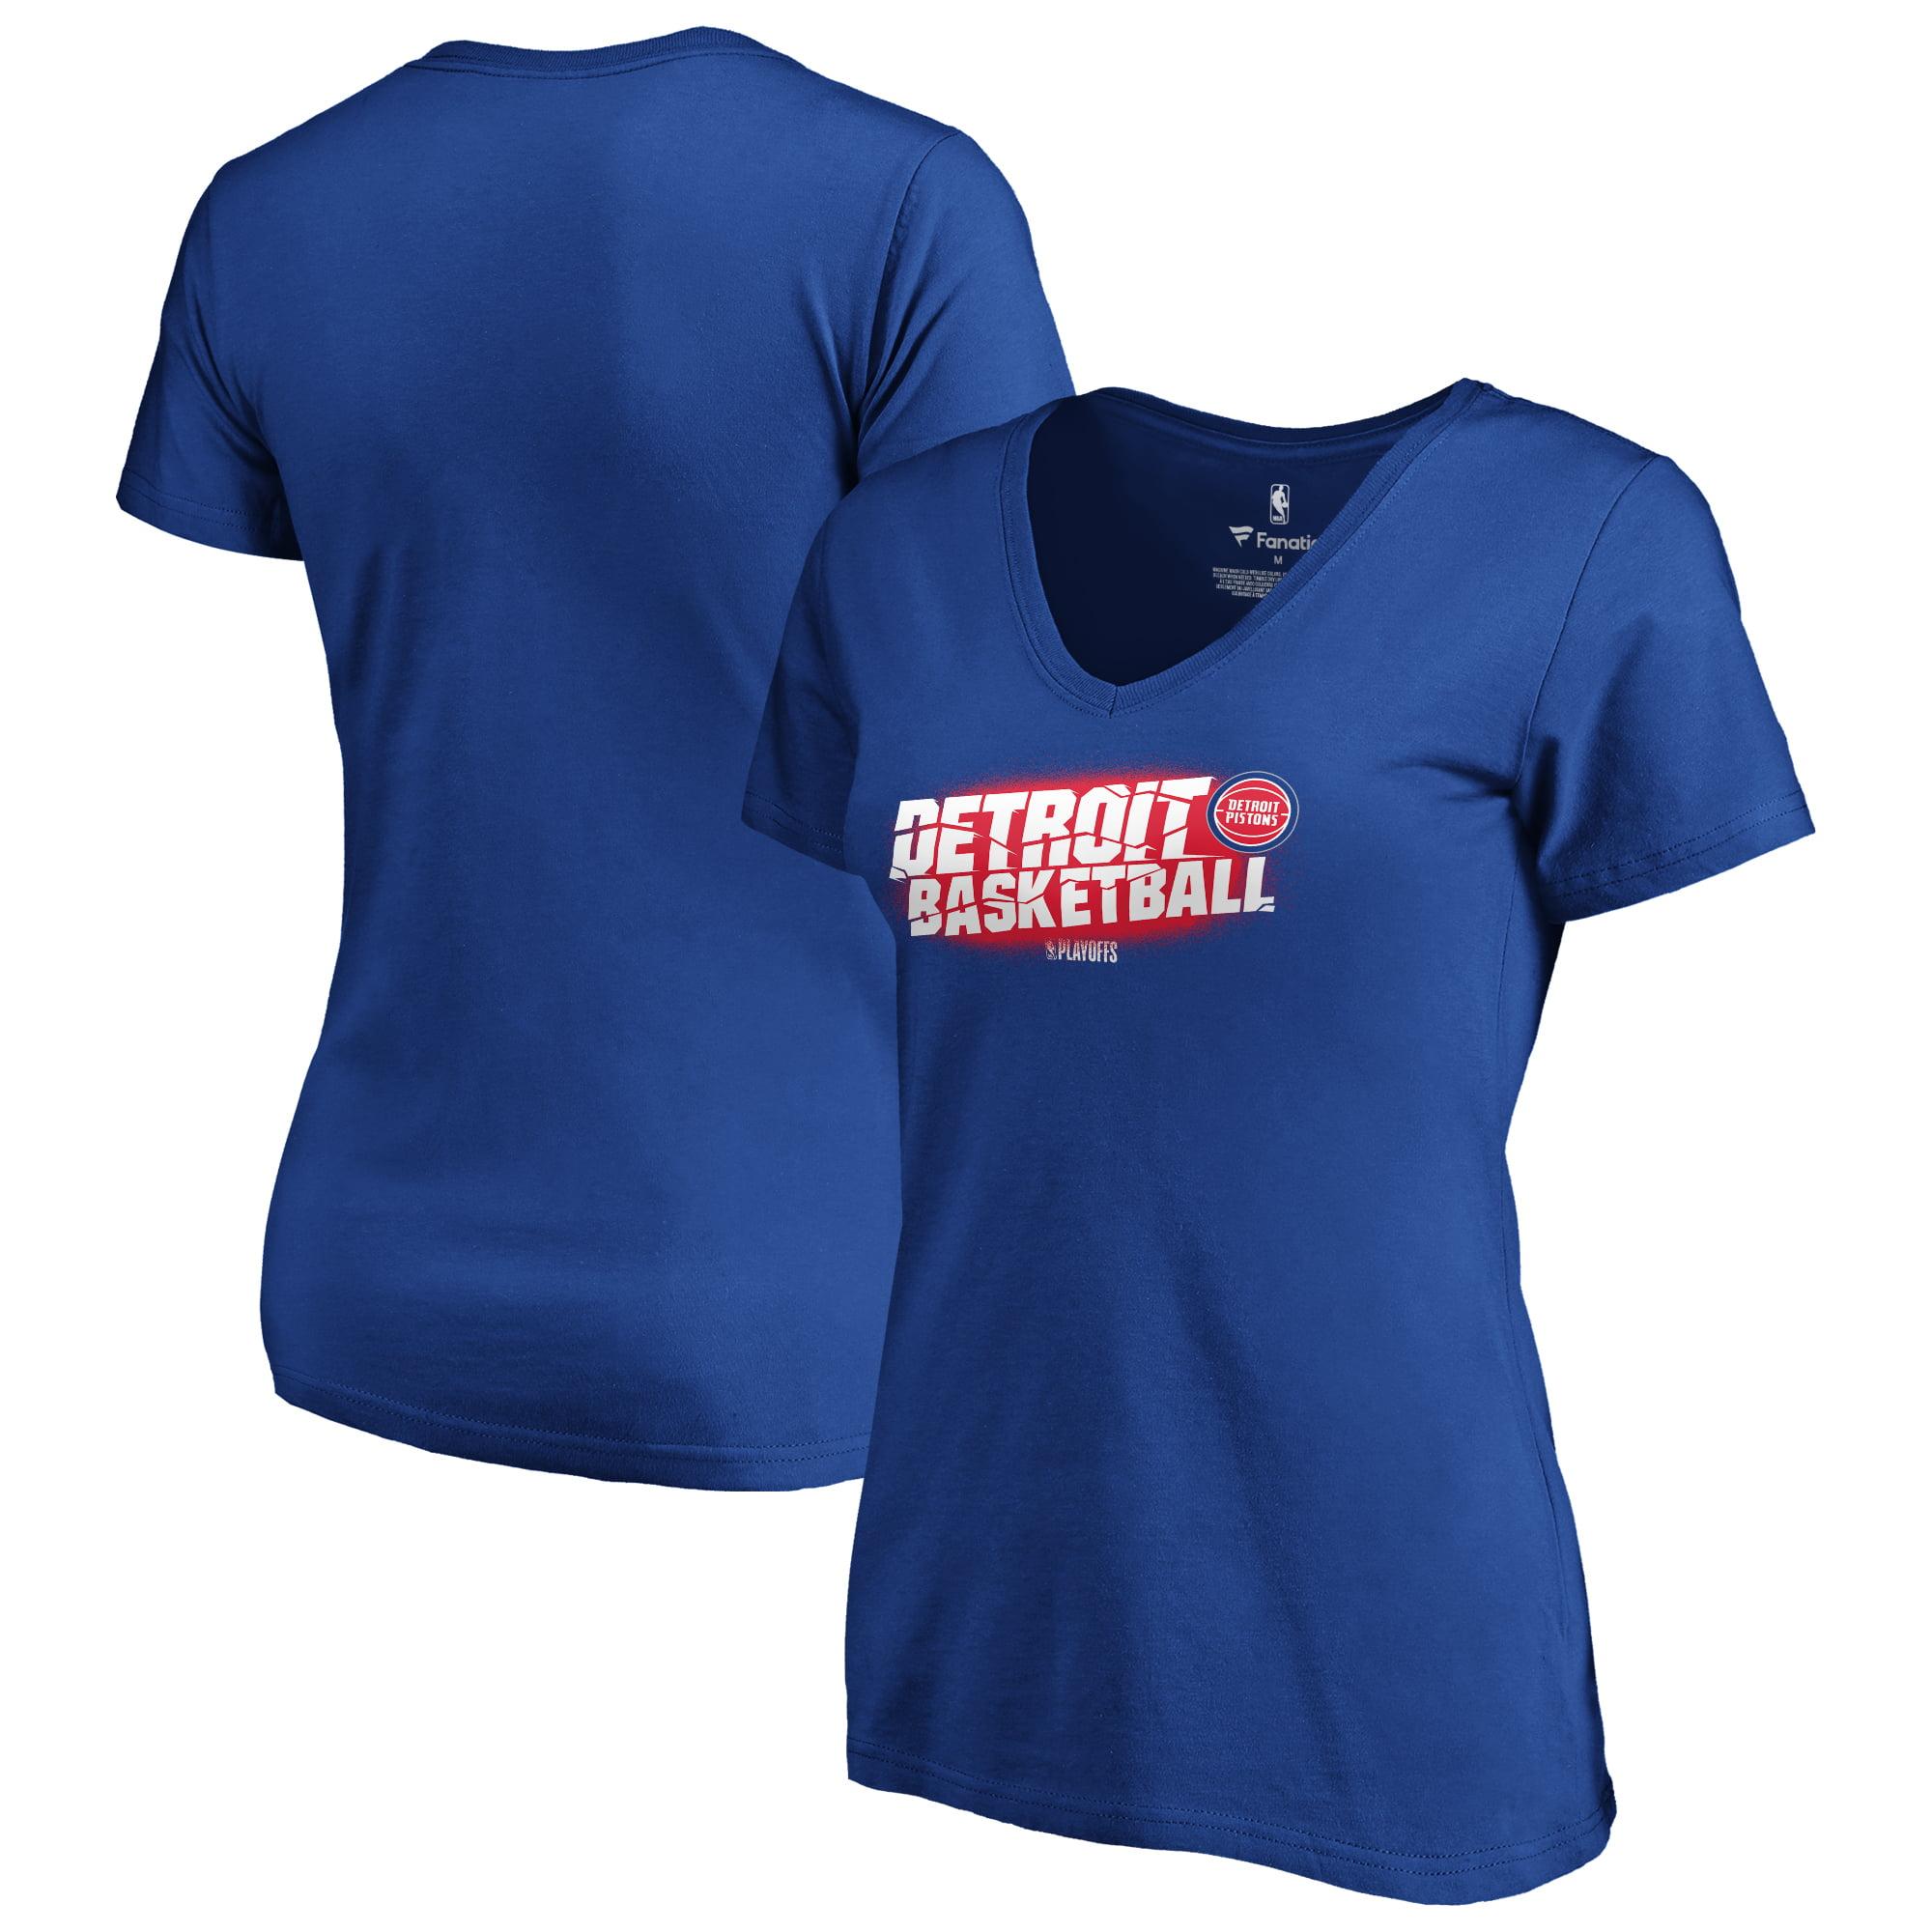 Detroit Pistons Fanatics Branded Women's 2019 NBA Playoffs Bound Tip Off Dunk Plus Size V-Neck T-Shirt - Royal